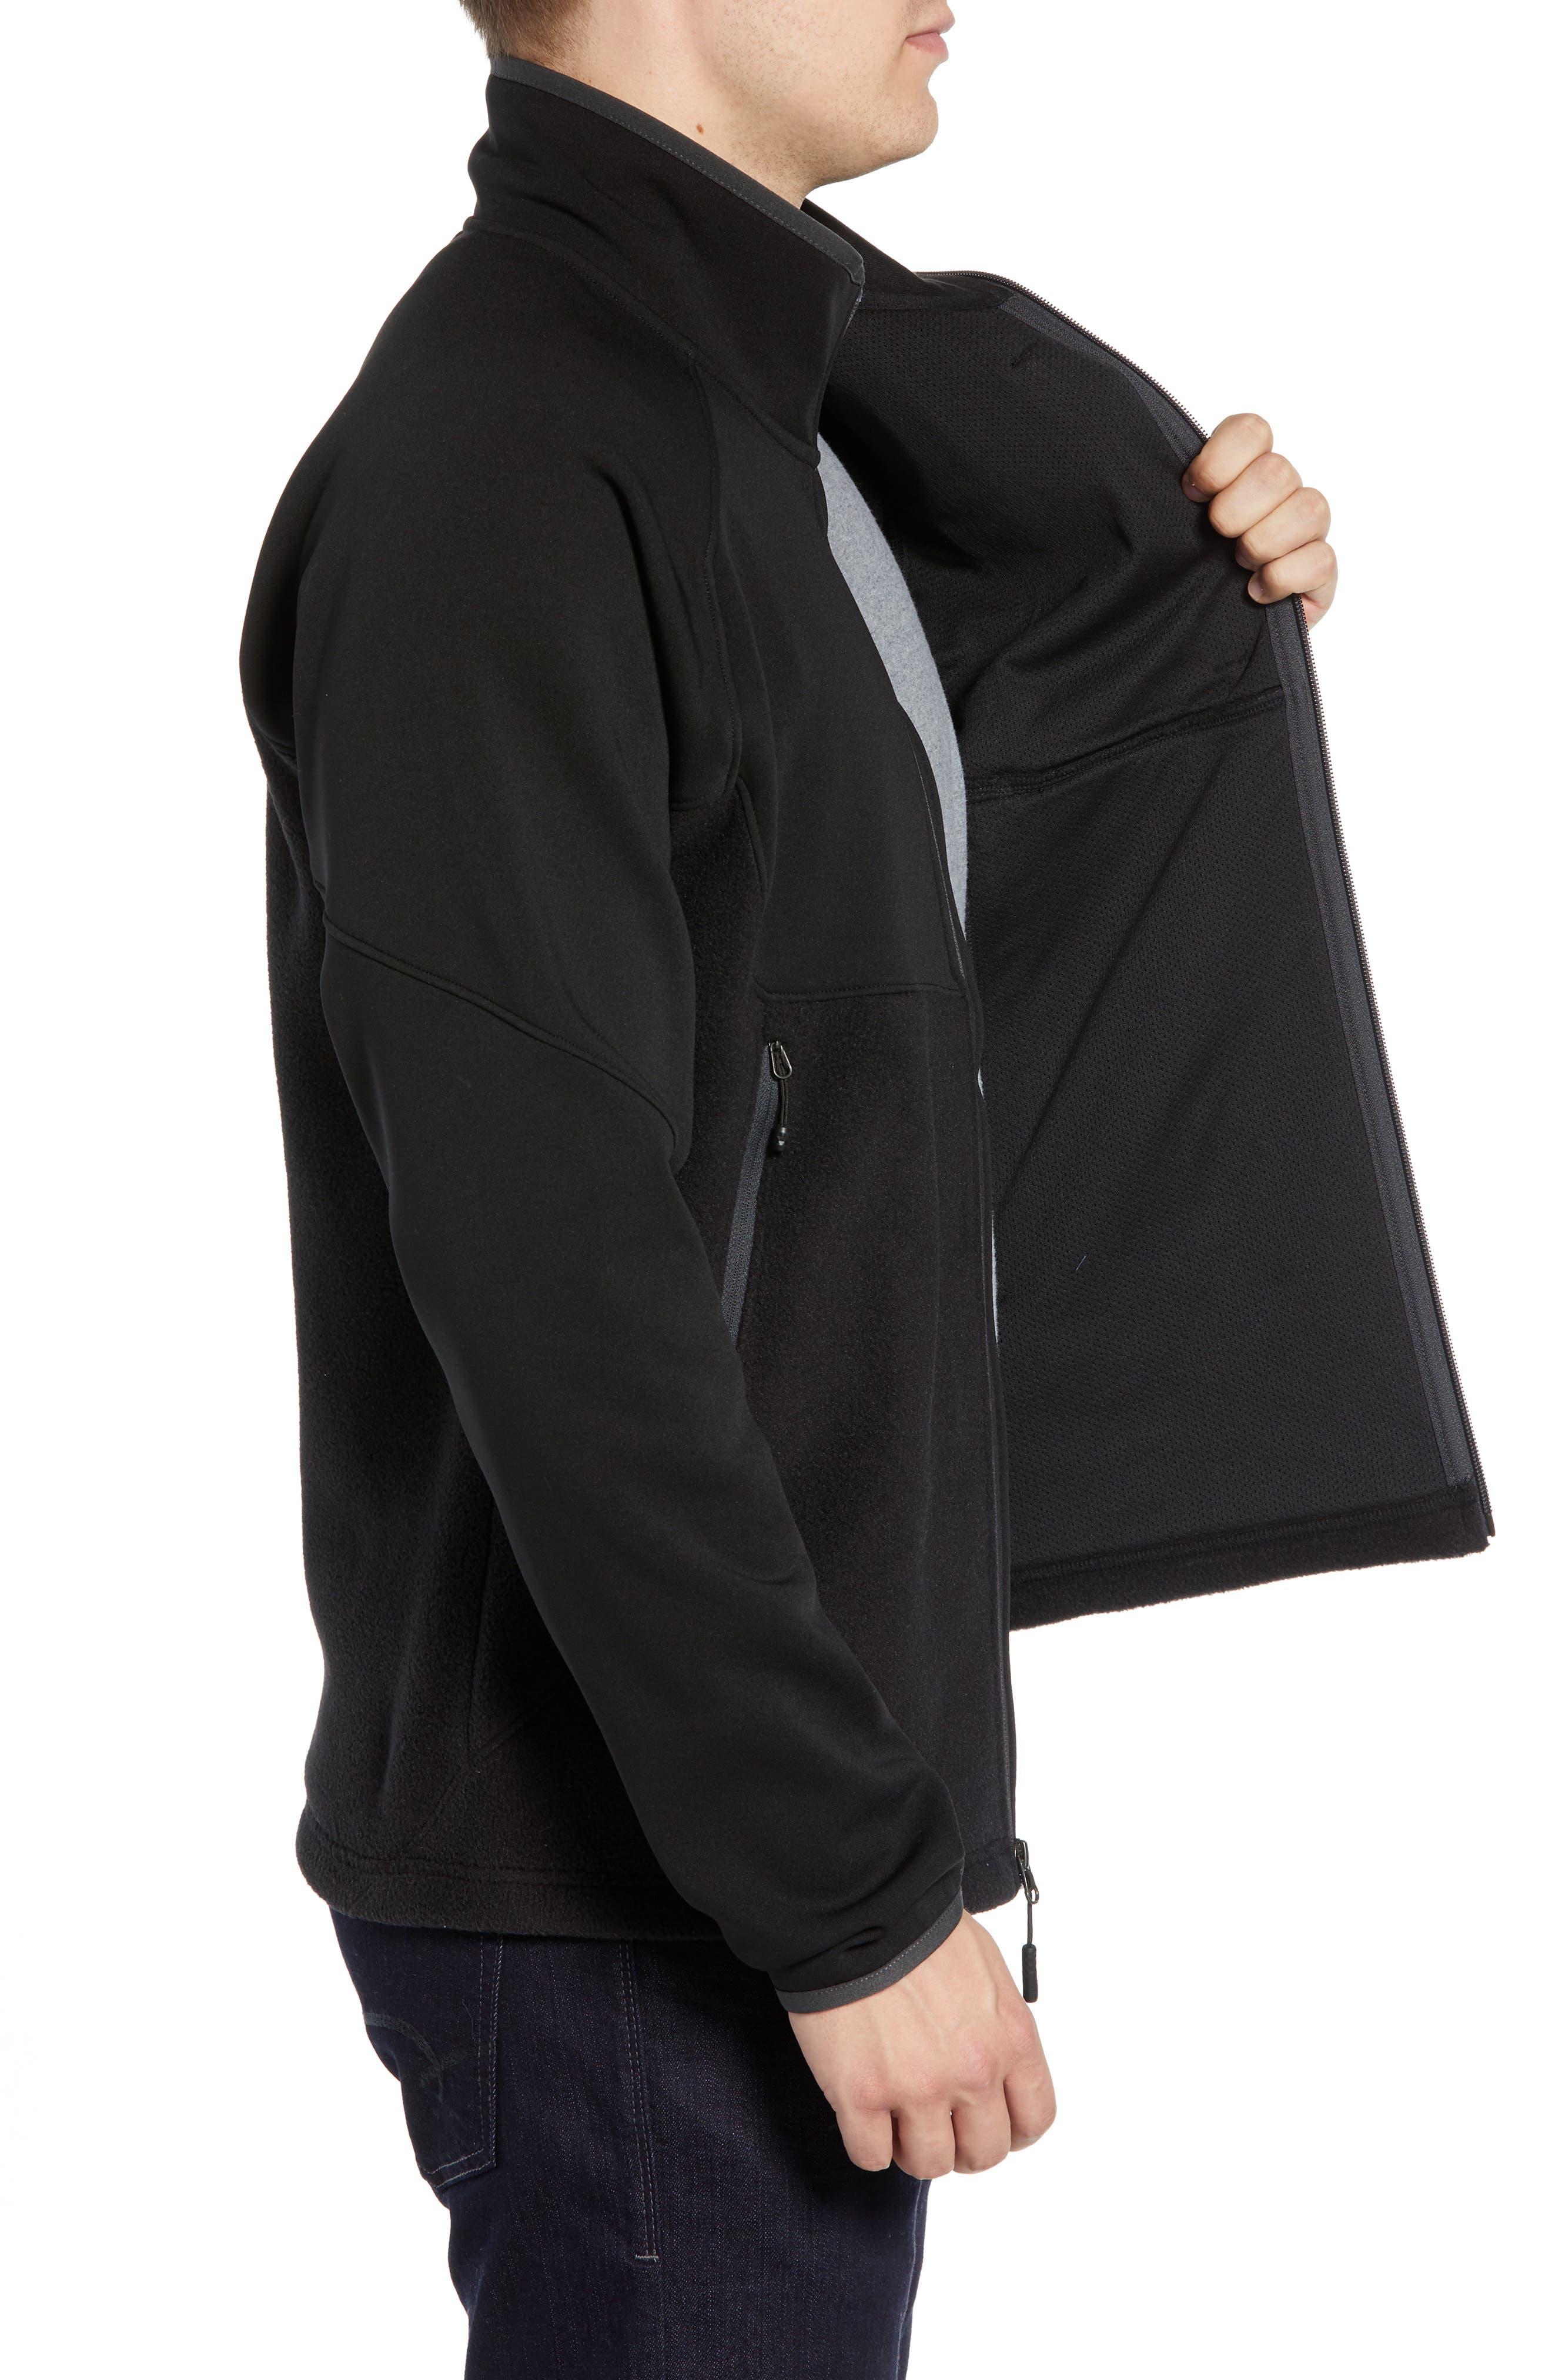 Tolmie Peak Hybrid Water Repellent Zip Jacket,                             Alternate thumbnail 3, color,                             TNF BLACK/ TNF BLACK